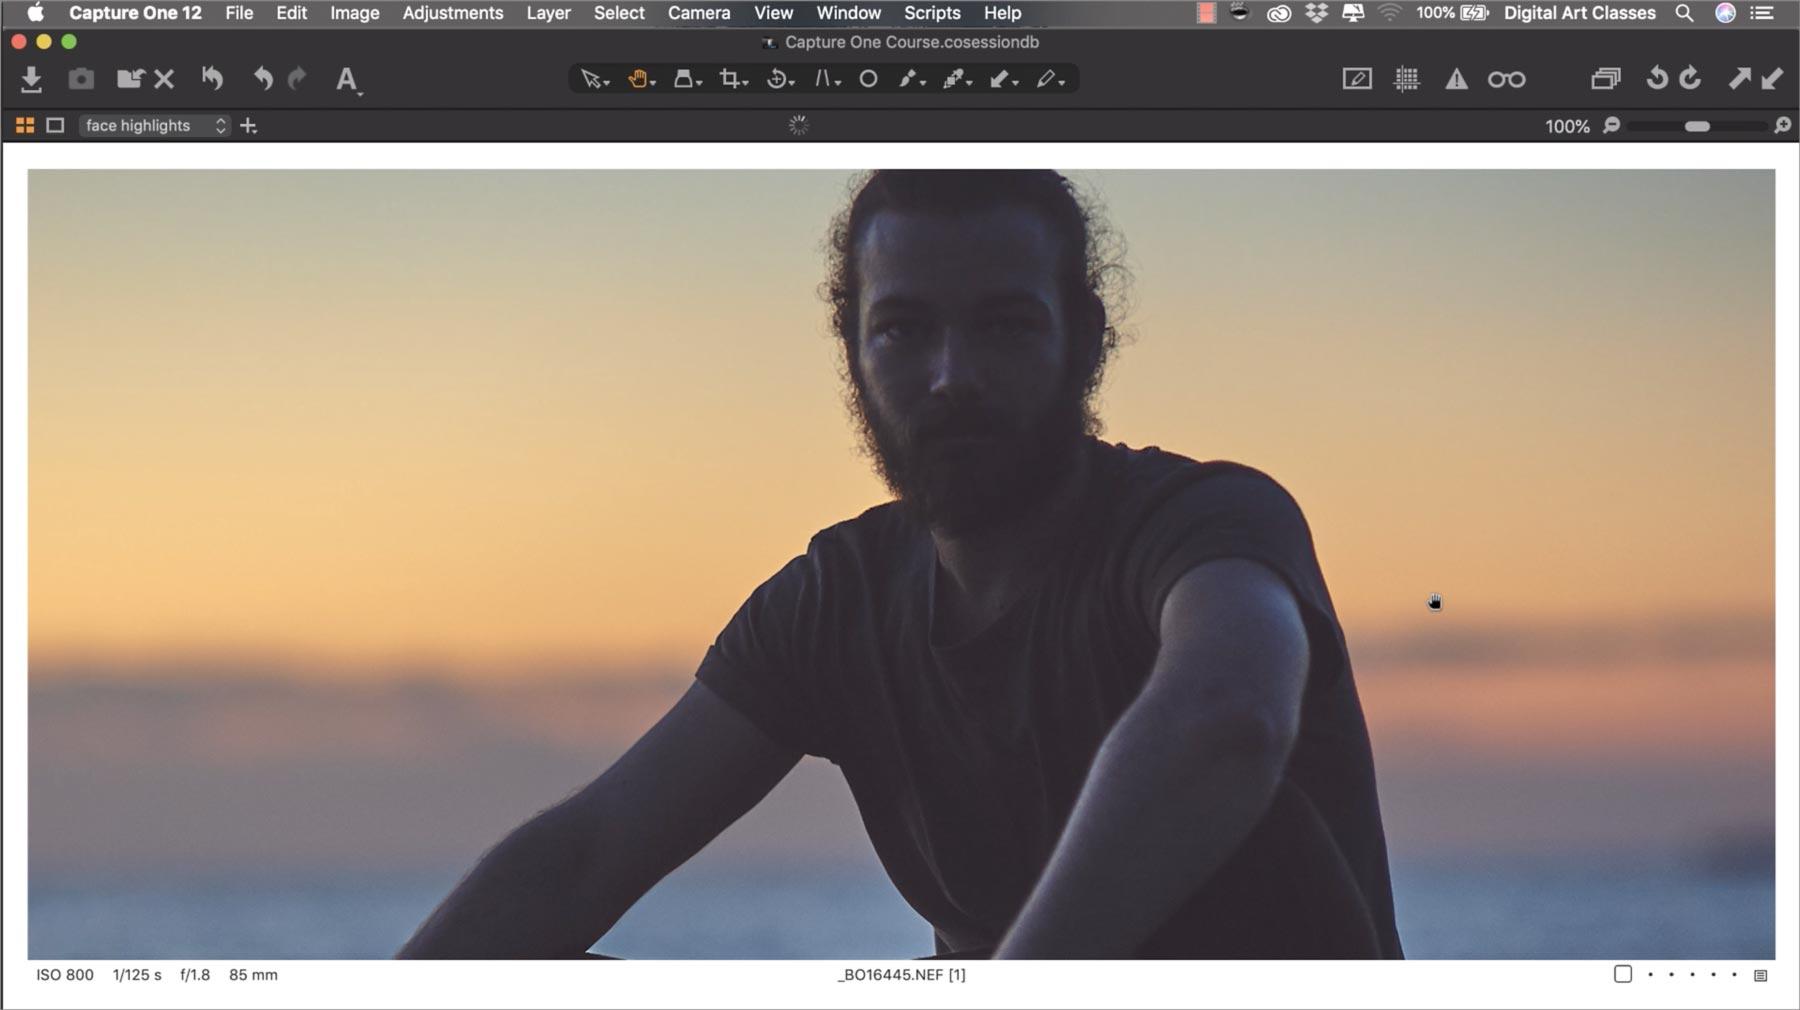 Complete Photo Edit: Chris Part 1, Marsascala sunrise